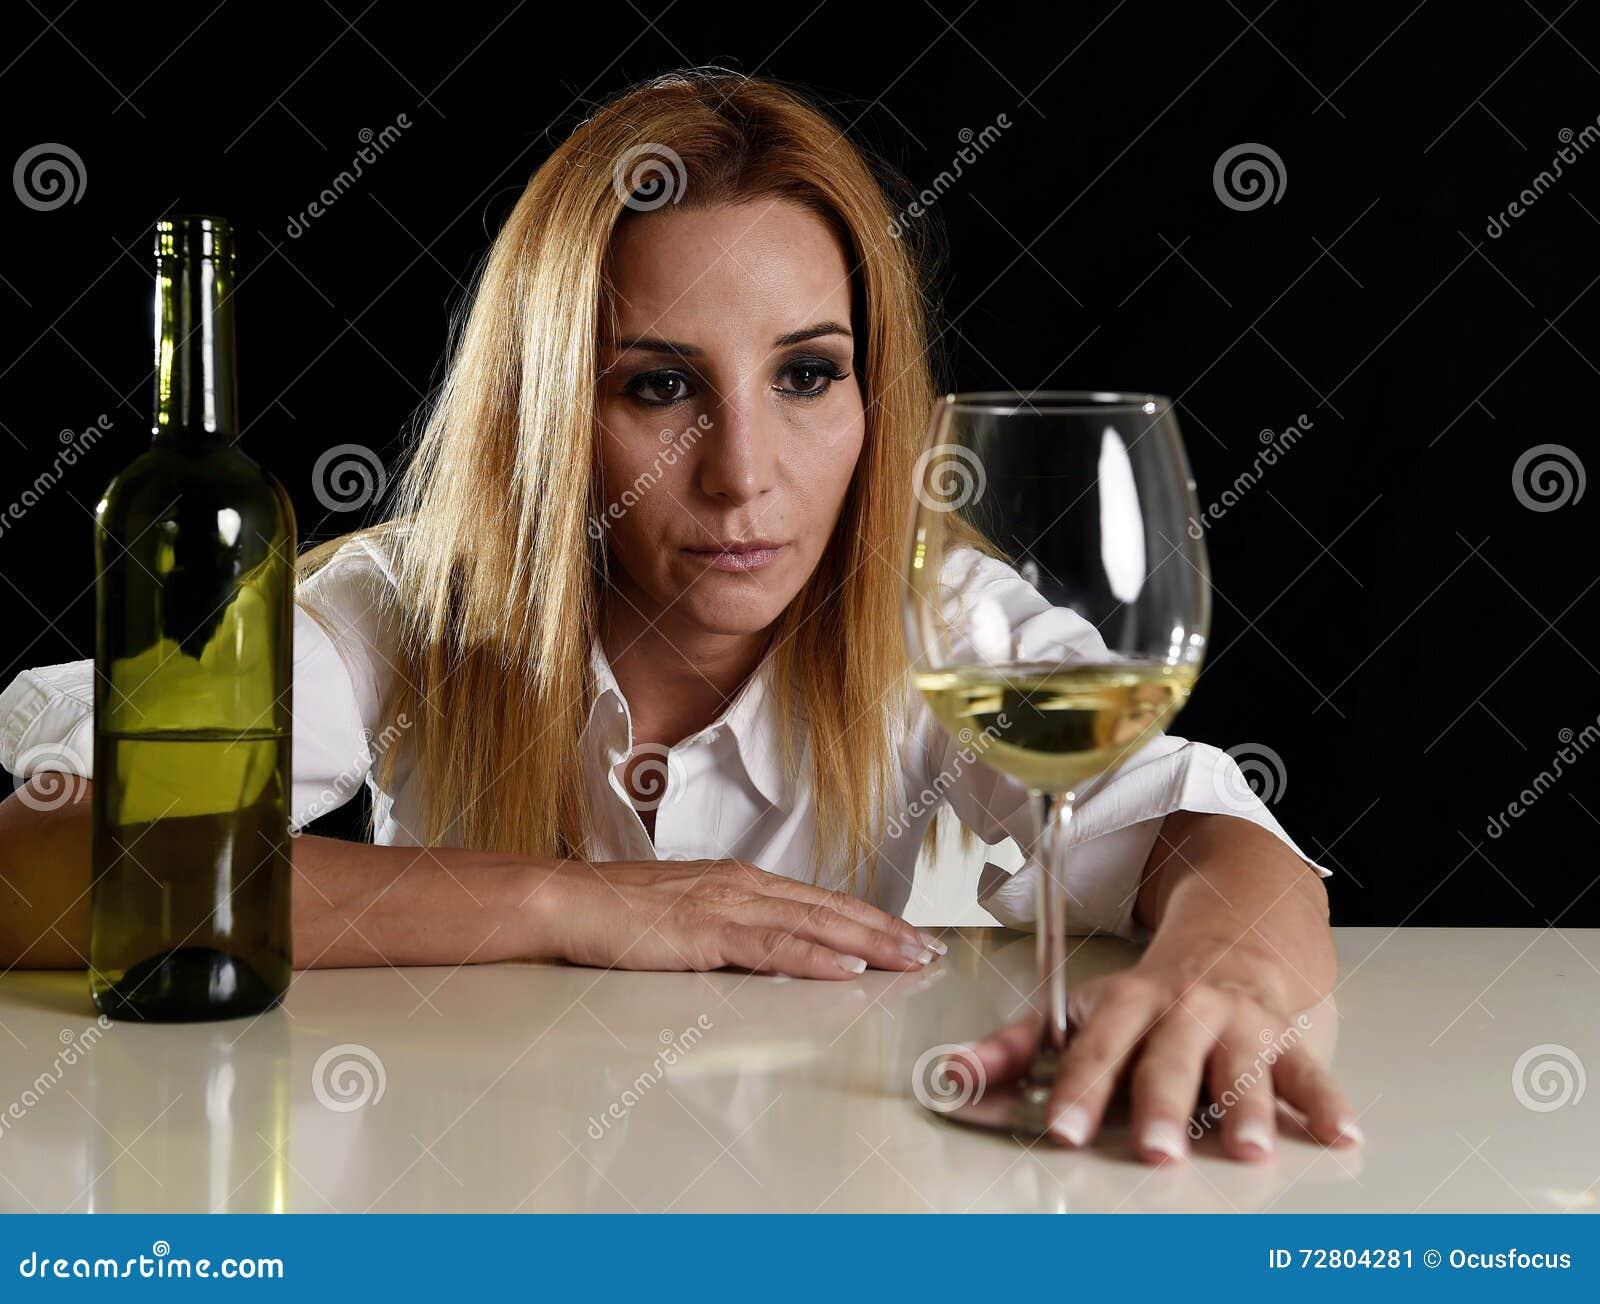 femme blonde alcoolique ivre dans le visage d prim gaspill semblant r fl chi au verre de vin. Black Bedroom Furniture Sets. Home Design Ideas